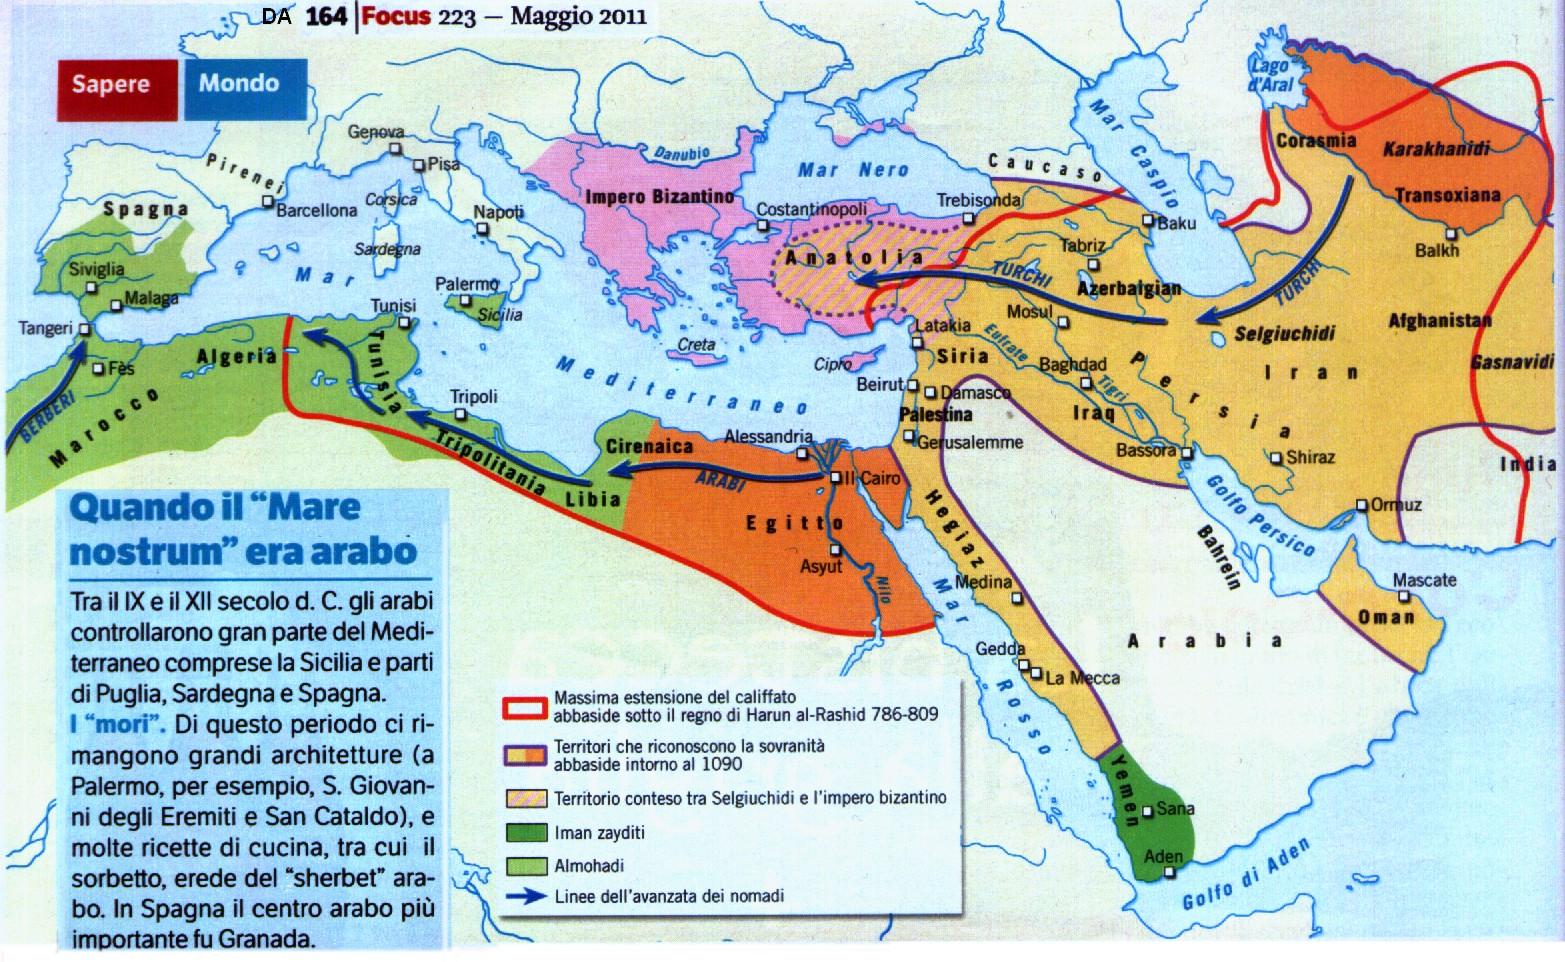 La raffinatissima cultura musulmana - Pagina 3 Mediterraneo_arabo